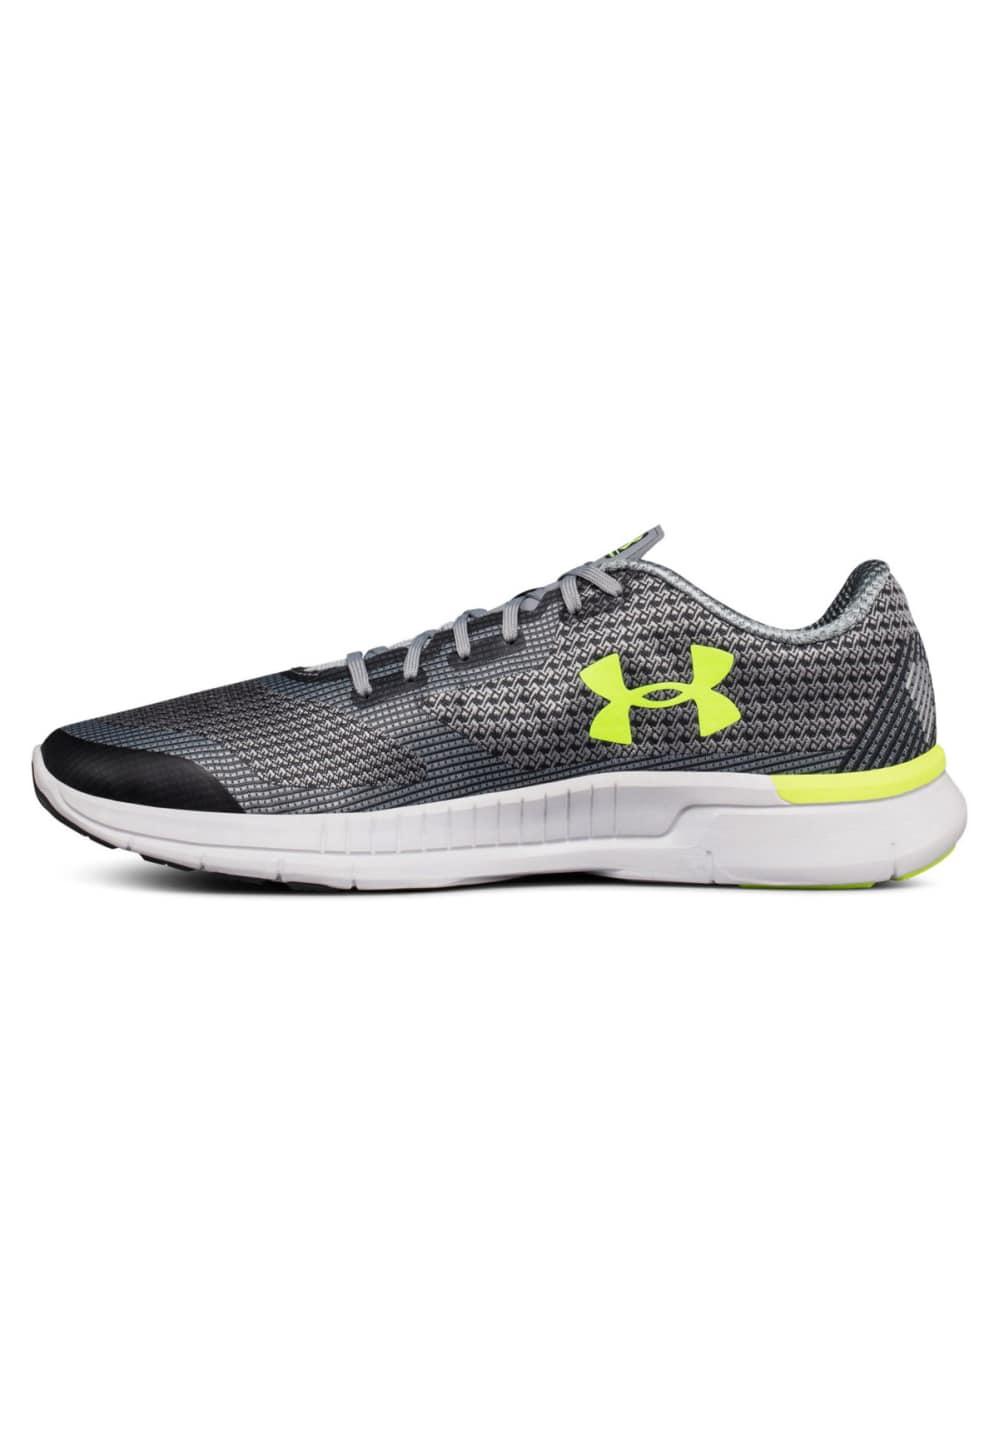 under armour tennis shoes mens